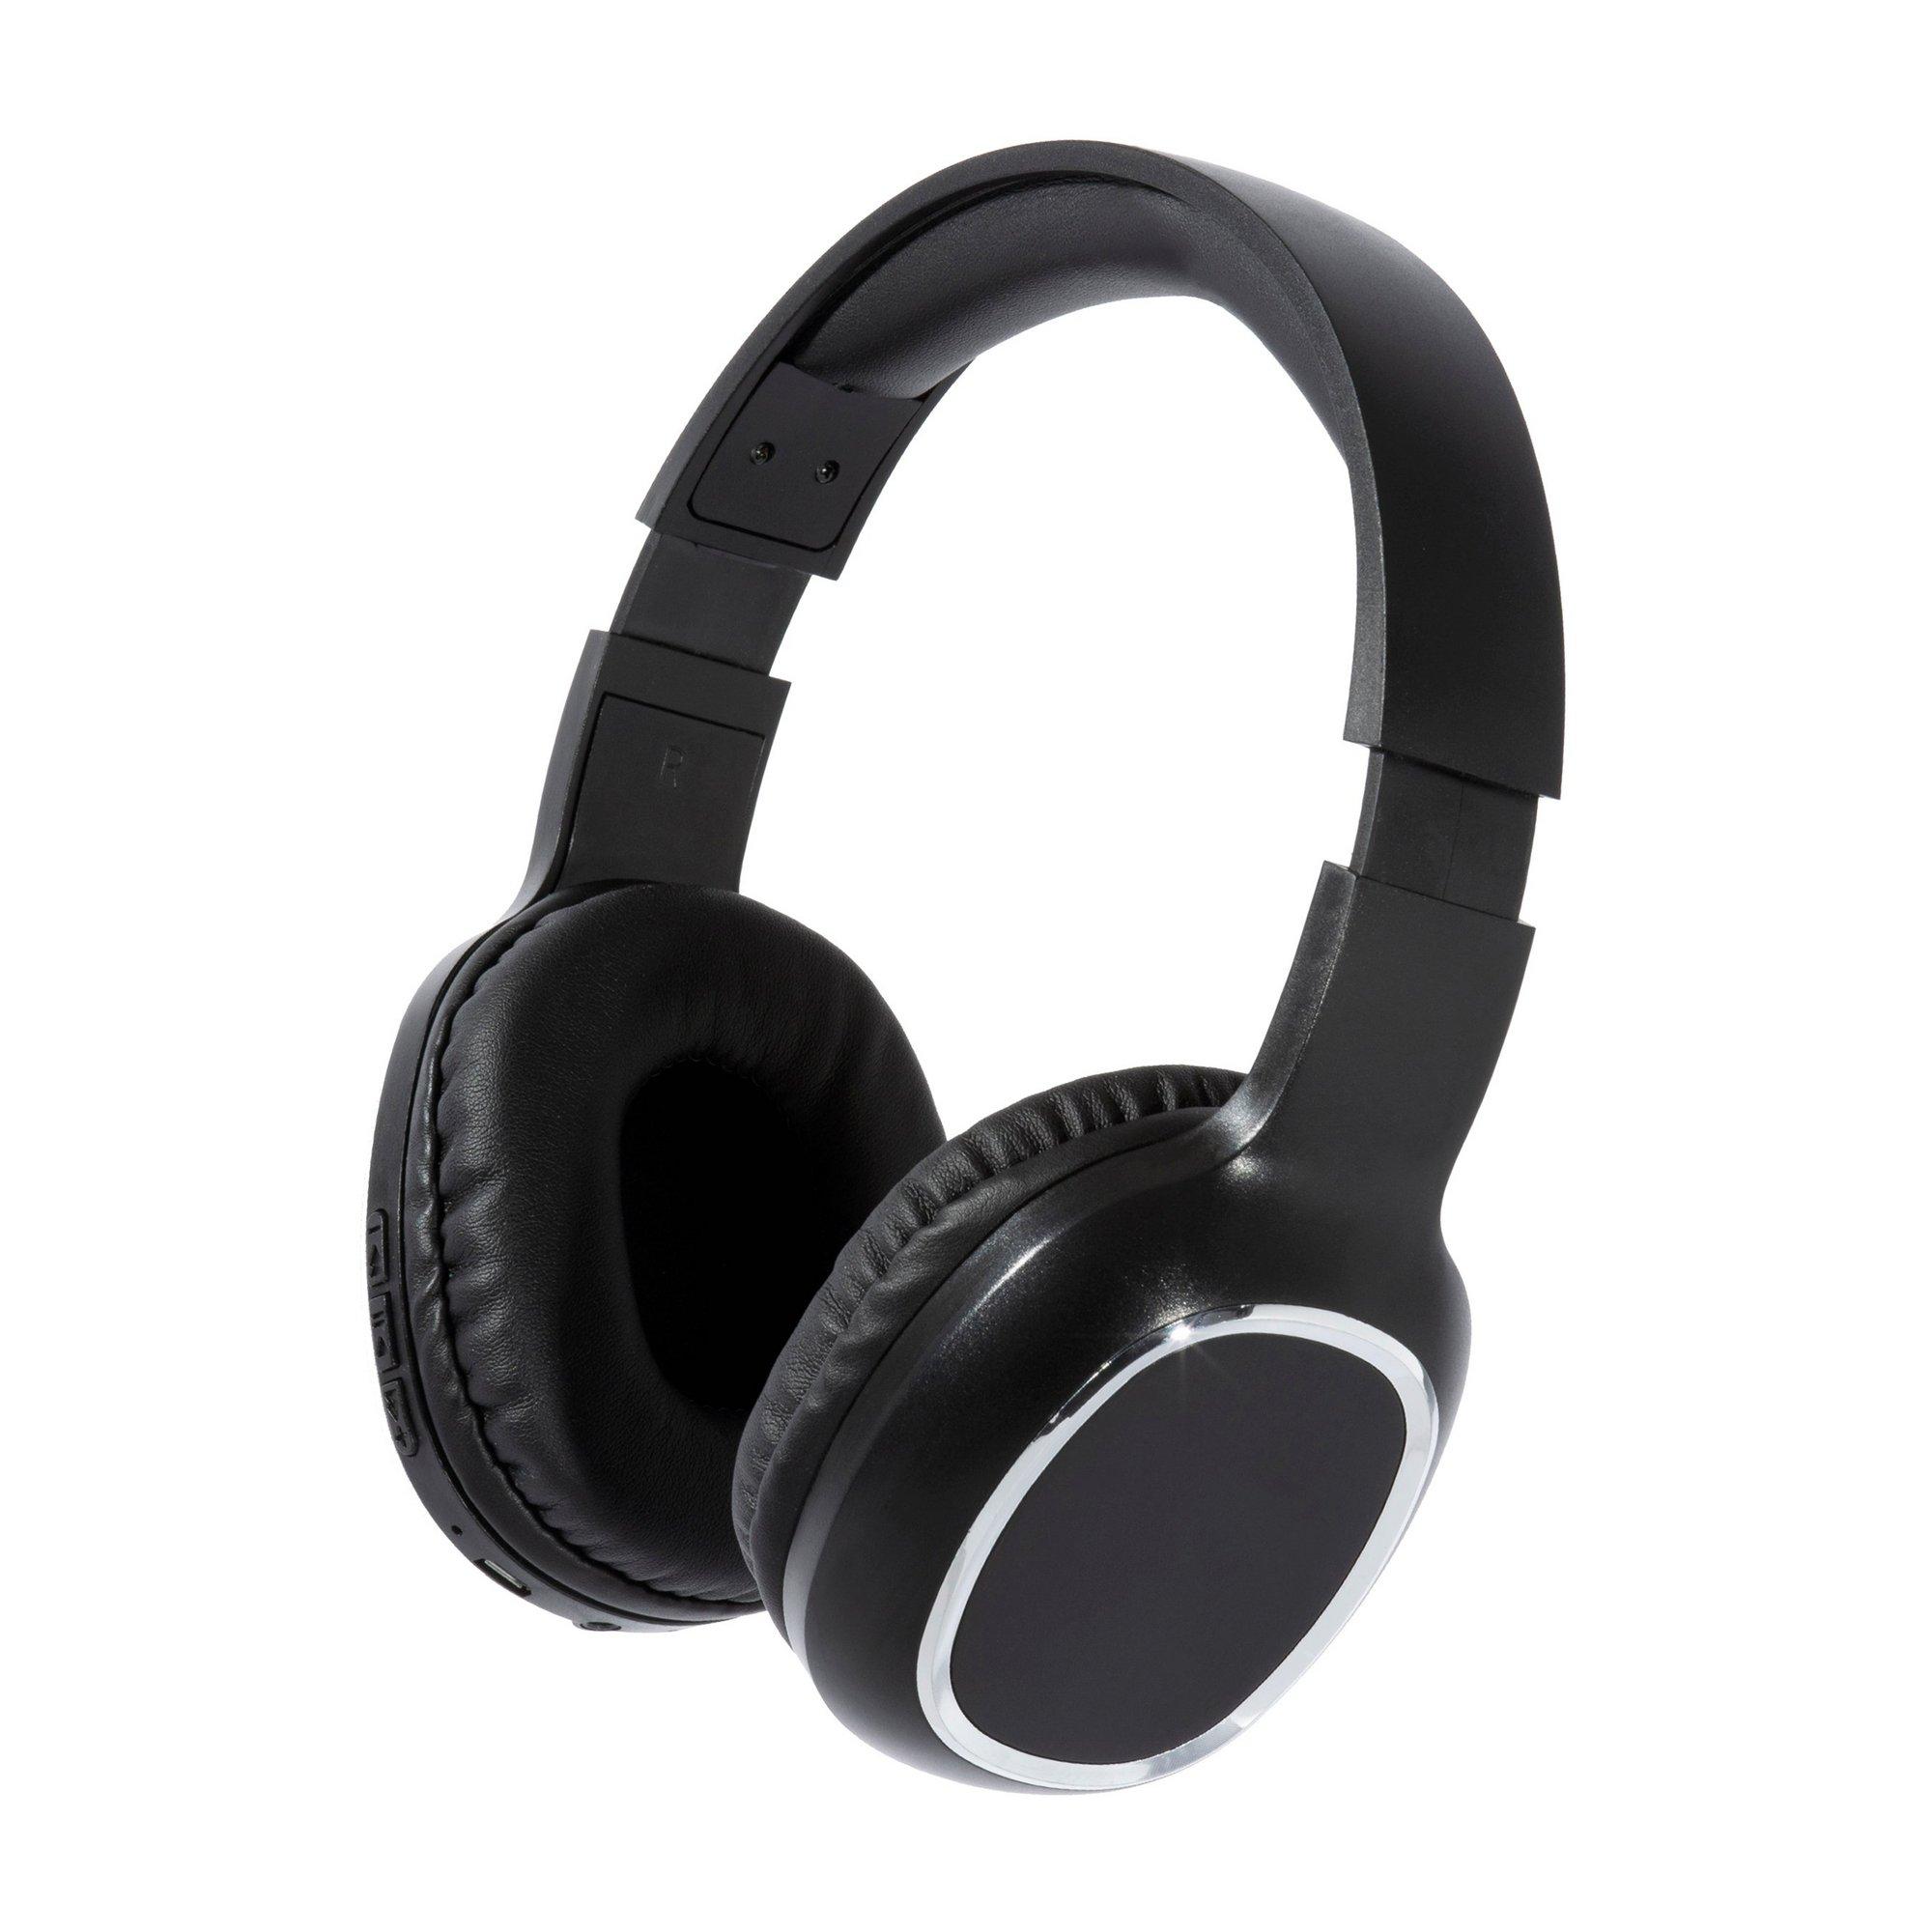 Image of Daewoo Bluetooth Headphones